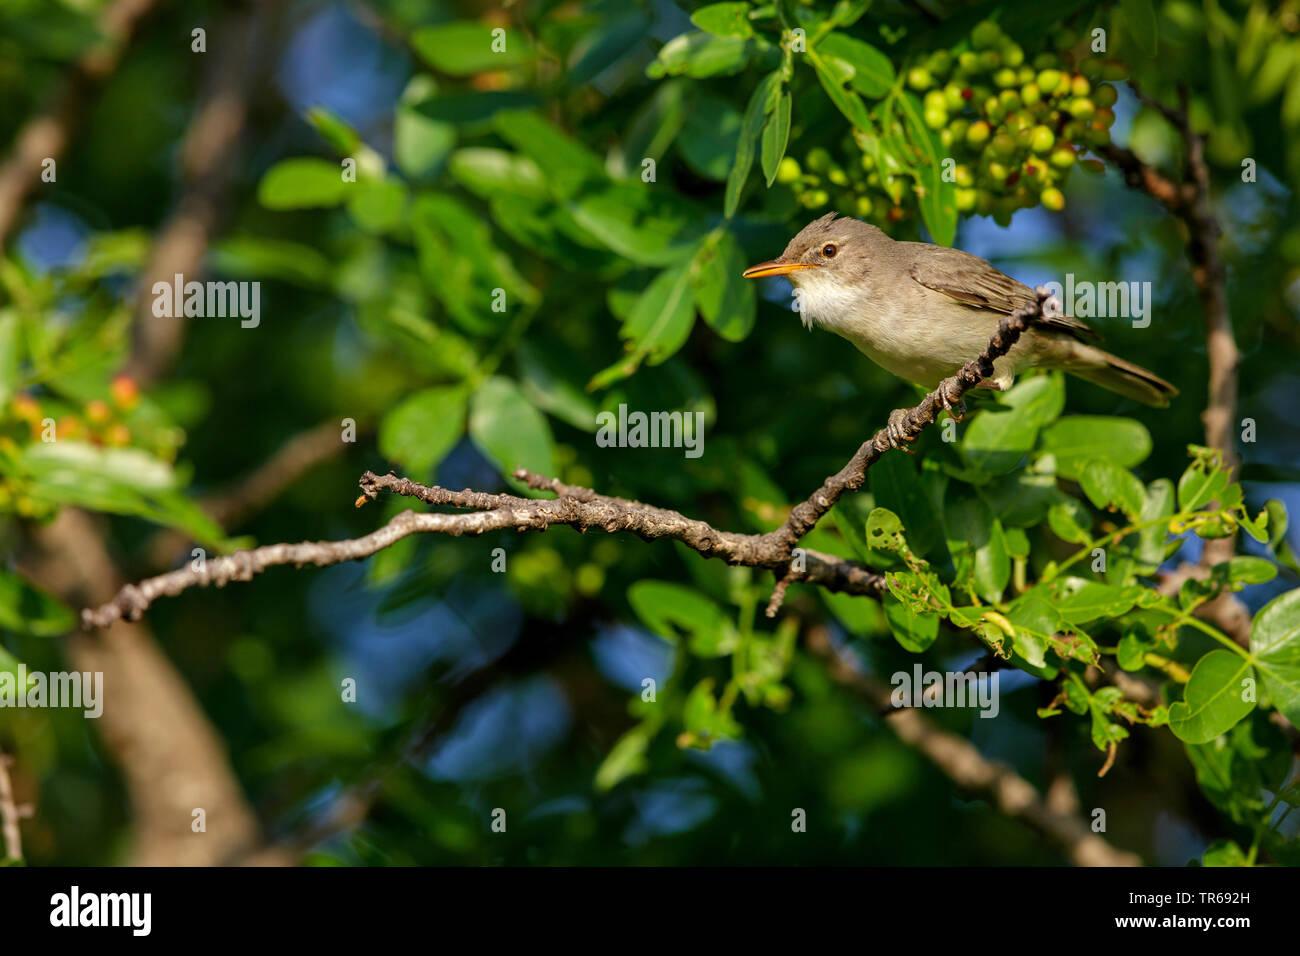 olive-tree warbler (Hippolais olivetorum), on a branch, Greece, Lesbos Stock Photo